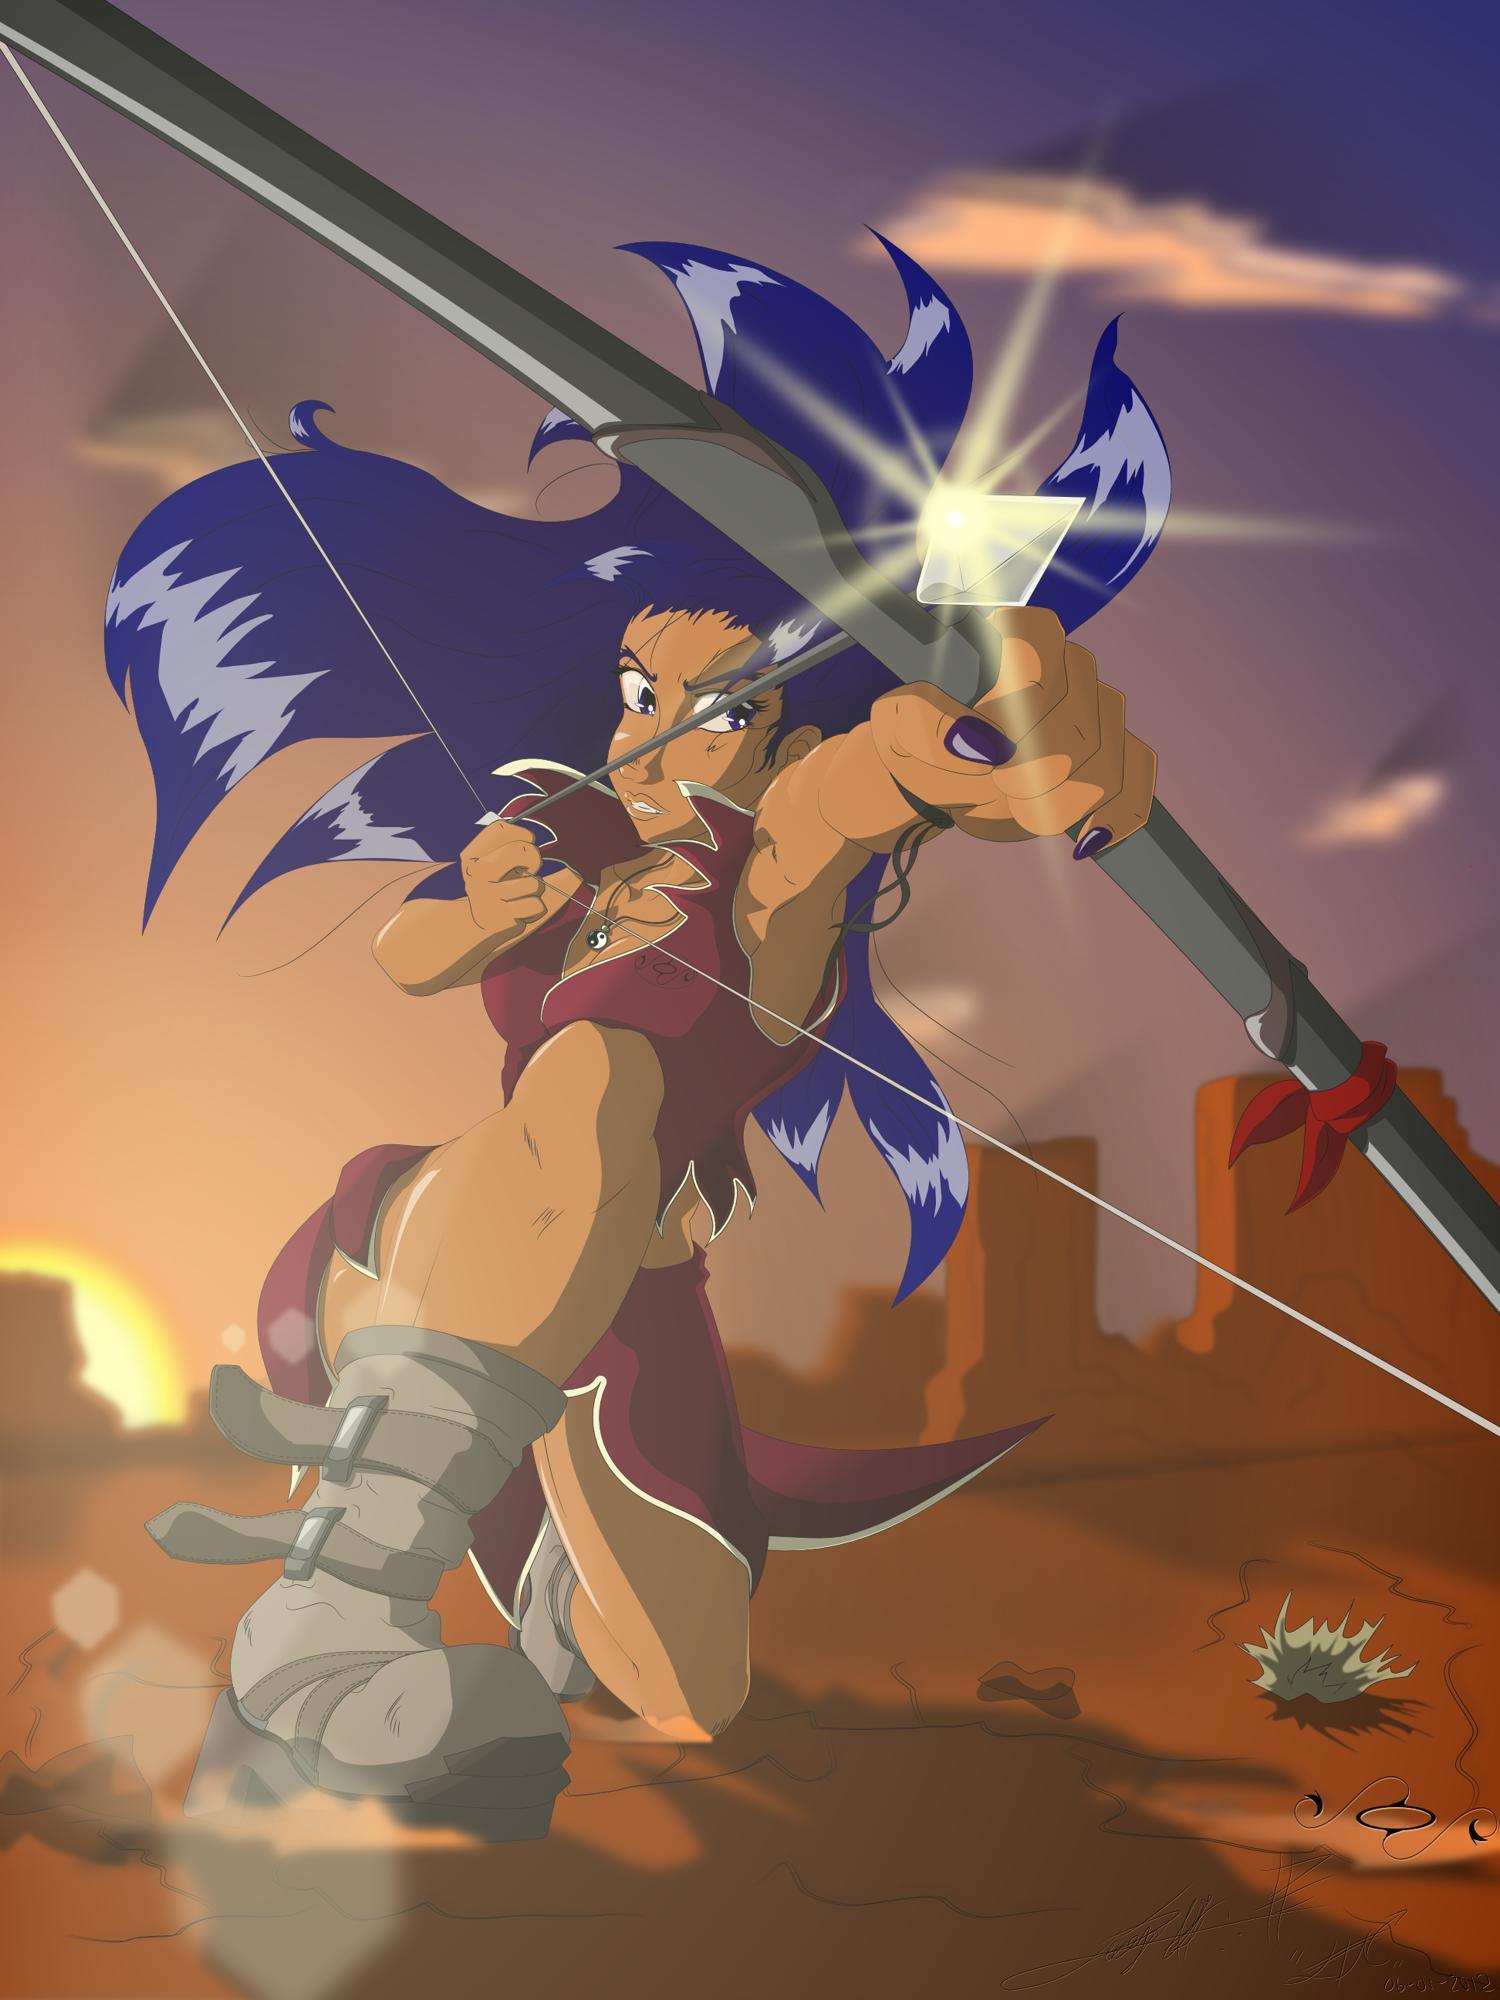 HS - Diana with bow and arrow